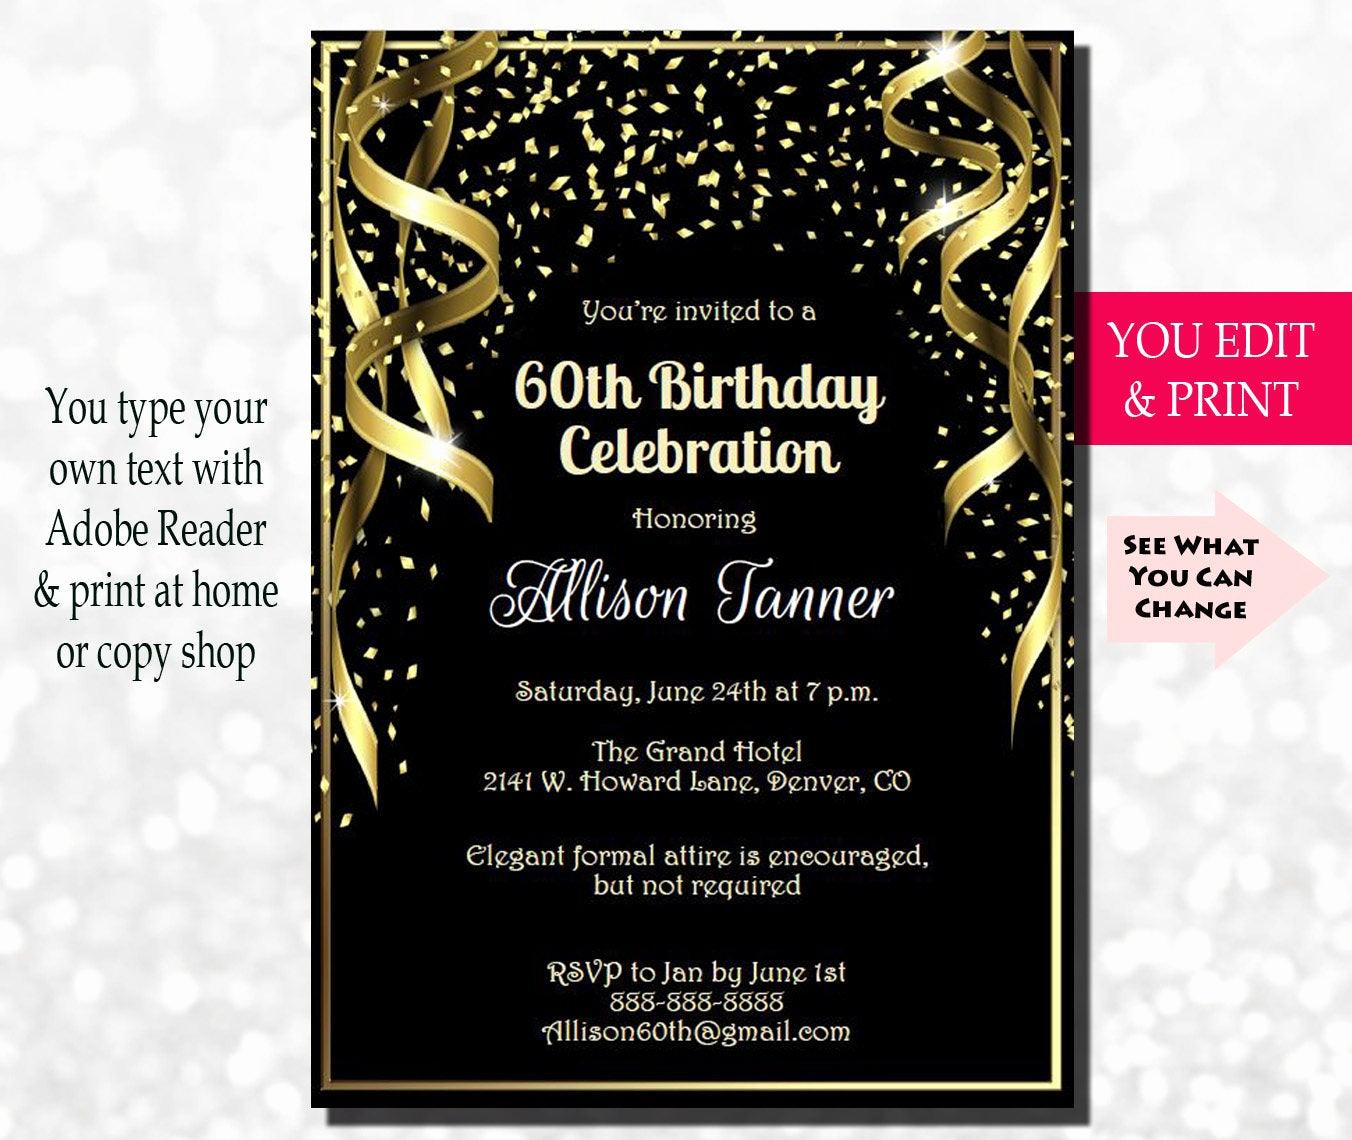 60th Birthday Invitation Wording Fresh 60th Birthday Invitation 60th Birthday Party Invitation 60th